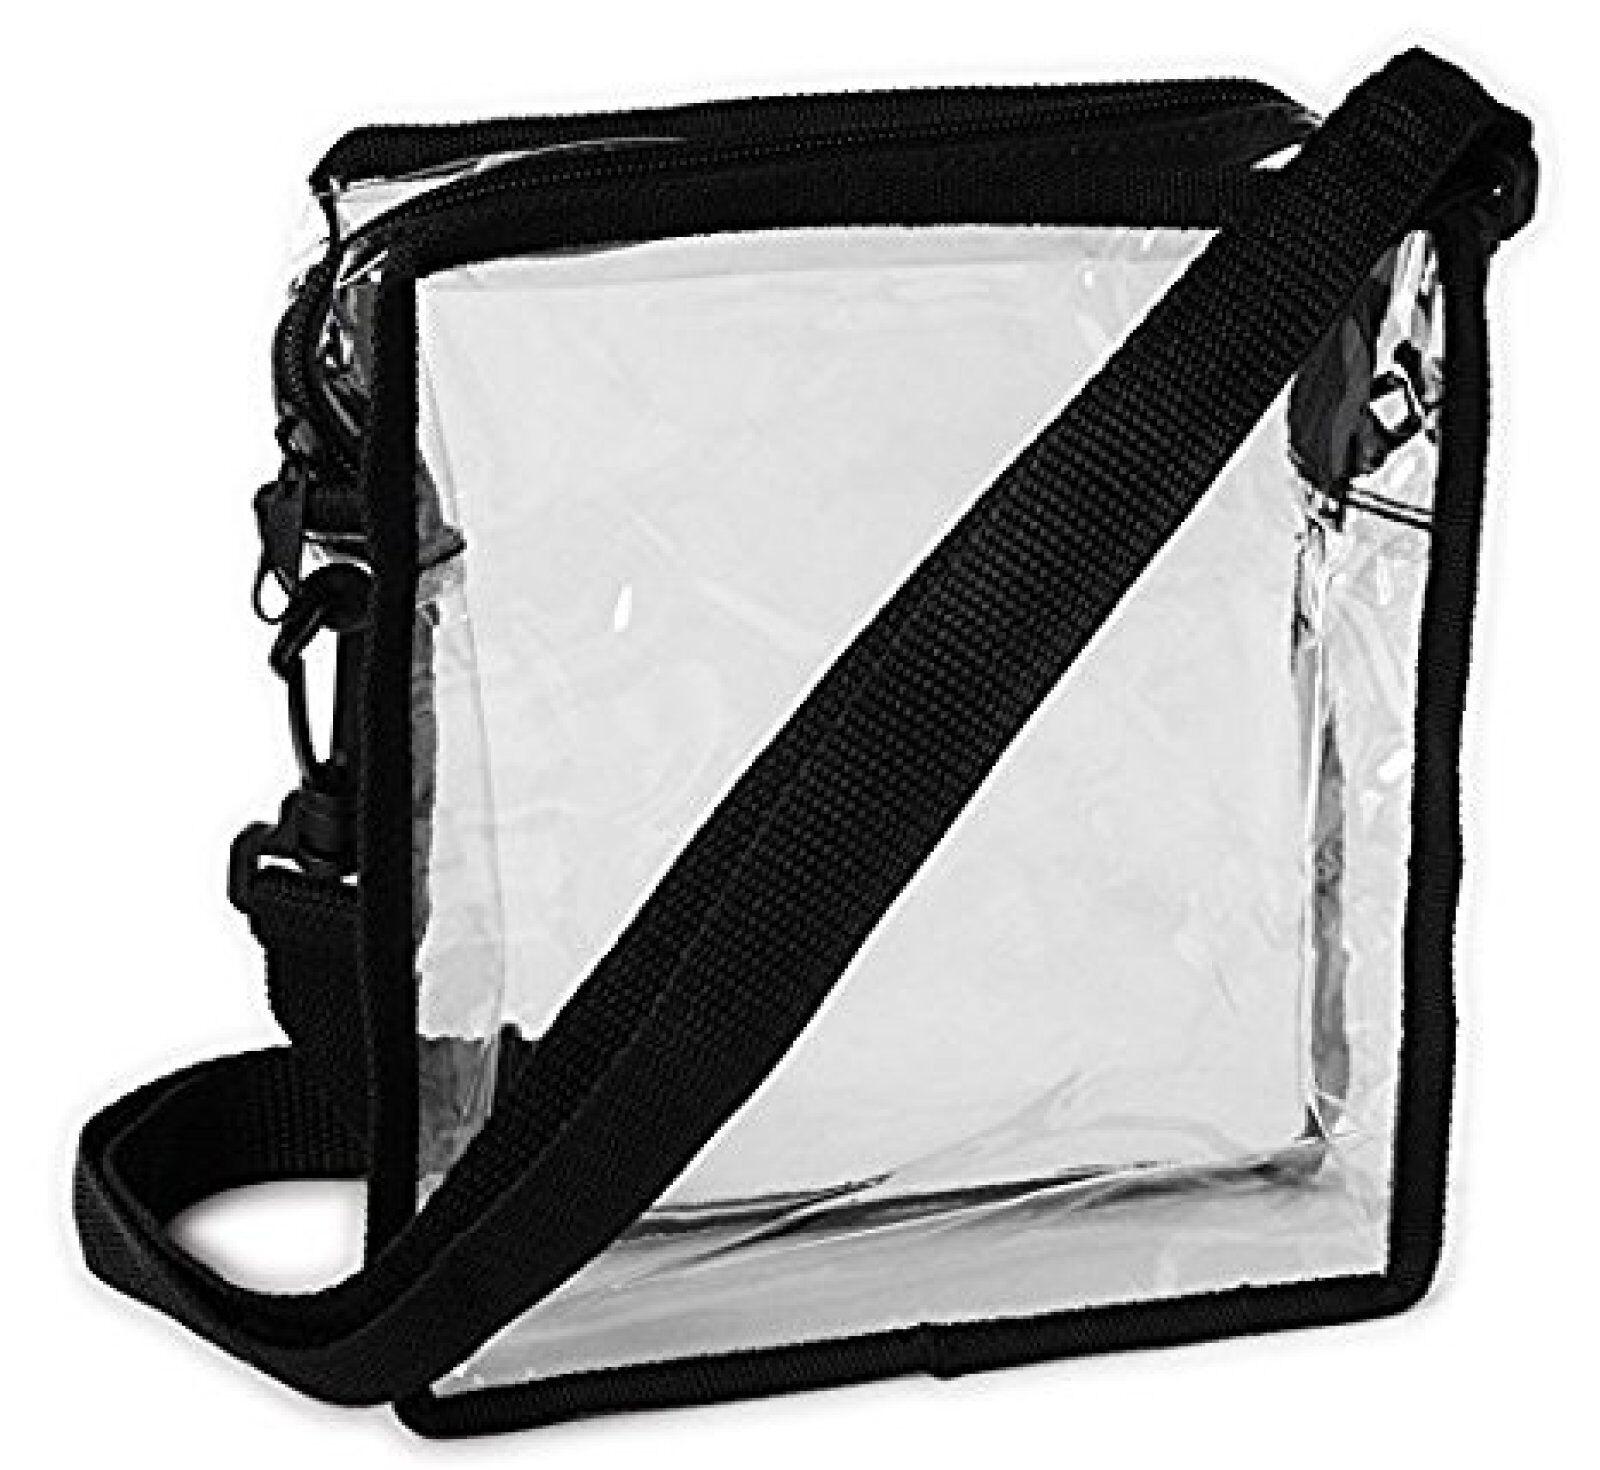 Annie Clear Tote Bag Pvc Crystal Clear Shoulder Strap Zip...